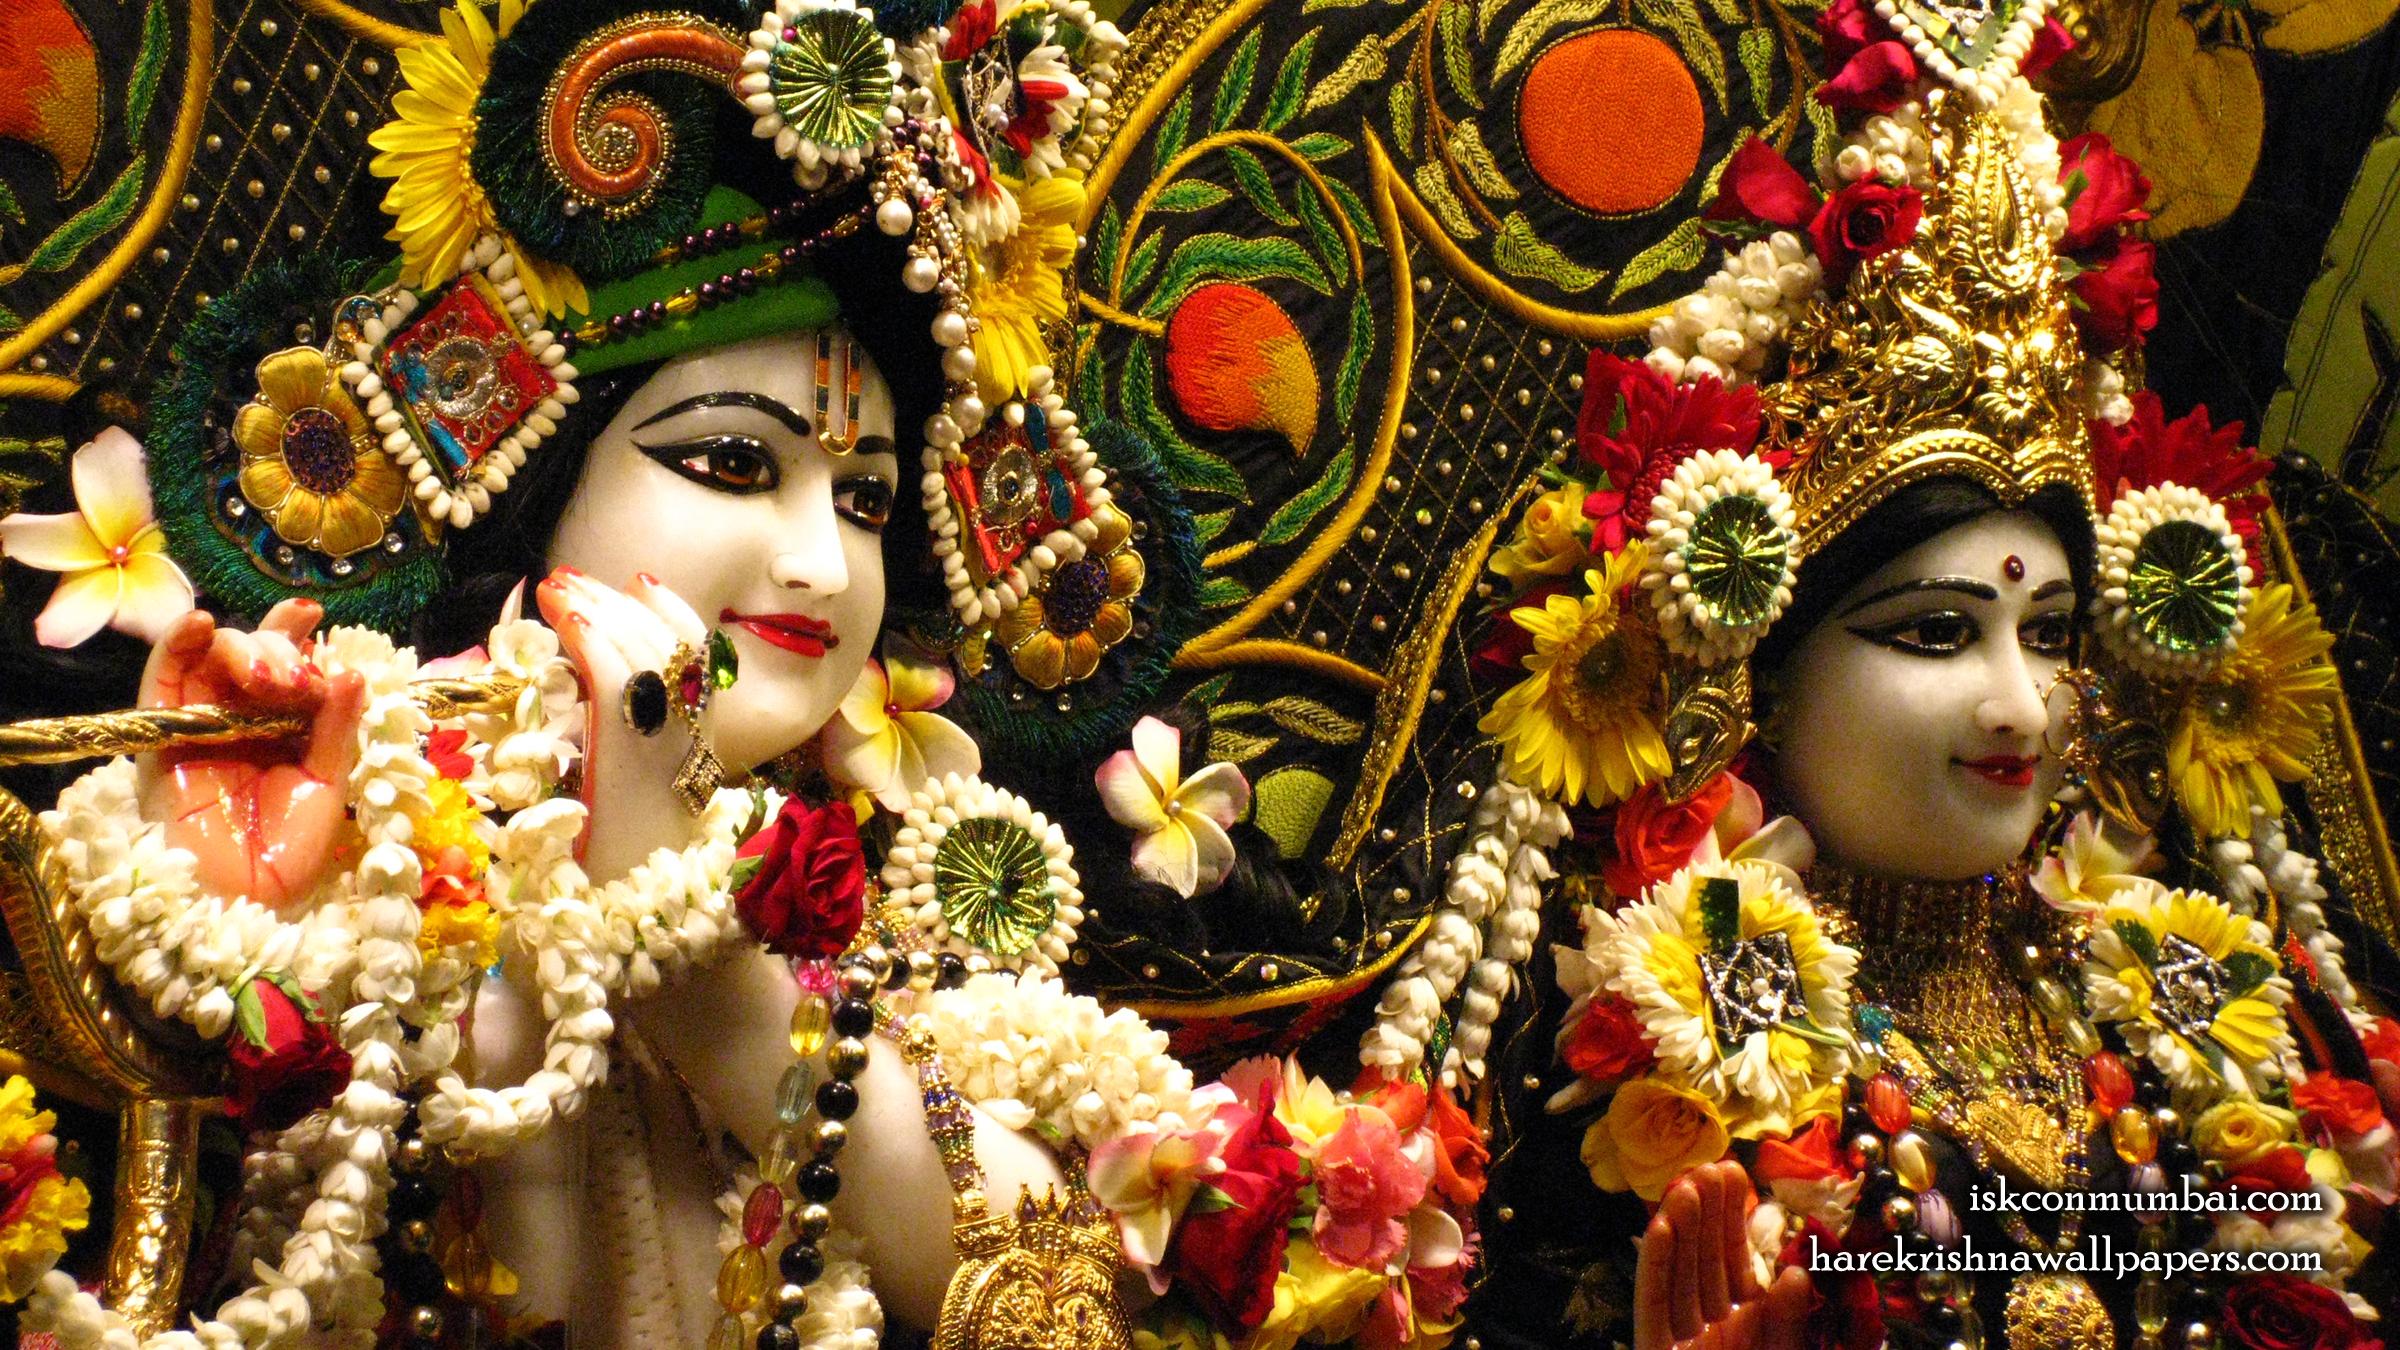 Sri Sri Radha Rasabihari Close up Wallpaper (030) Size 2400x1350 Download